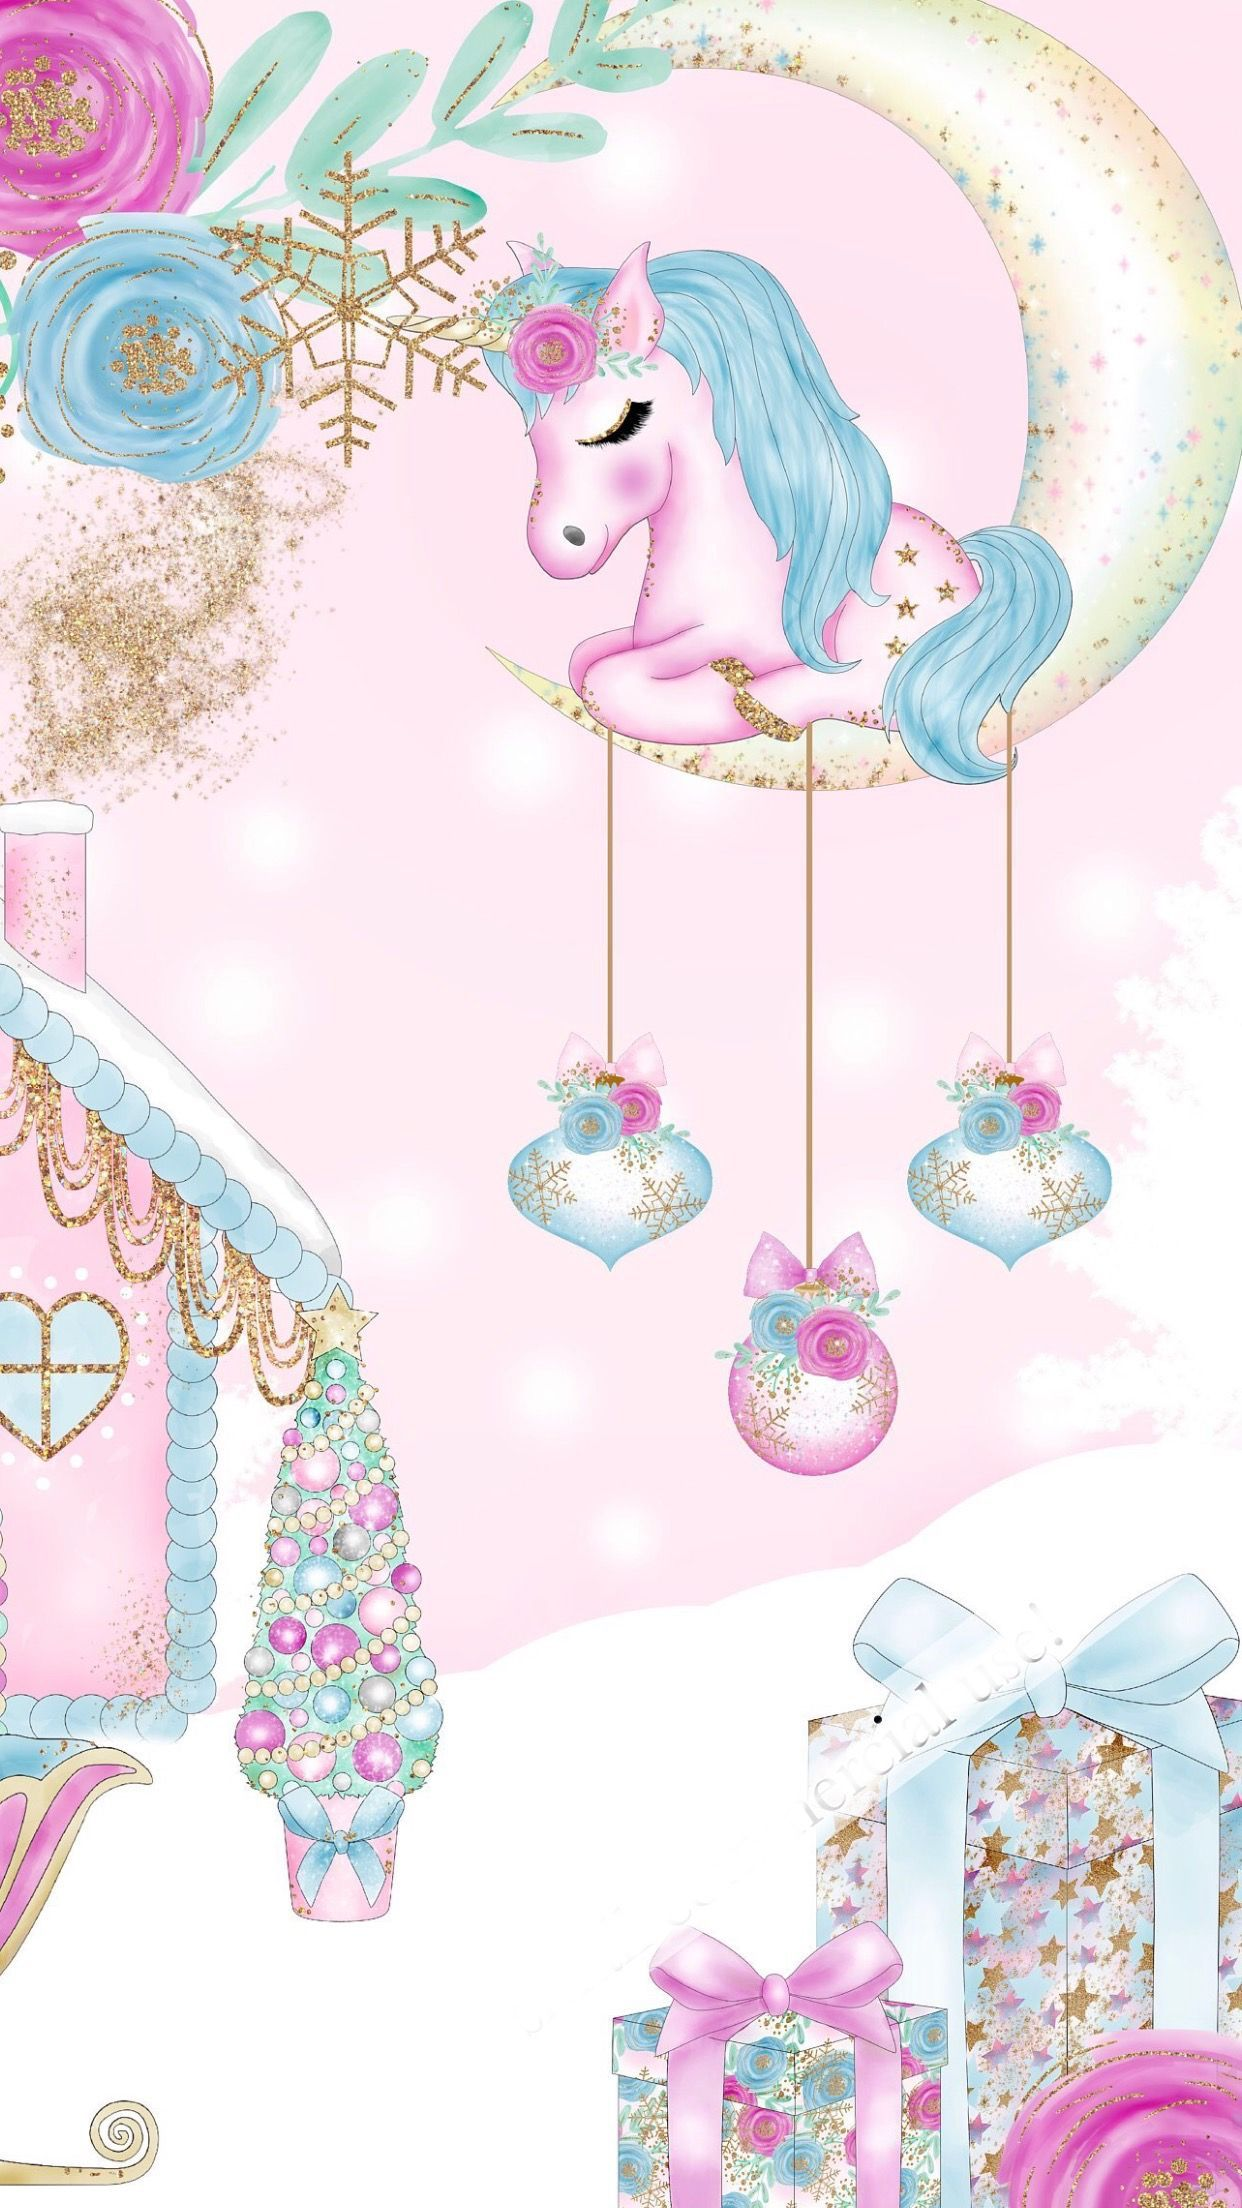 Pin By Lucia Hermosa On Dibujos Unicorn Wallpaper Cute Unicorn Wallpaper Baby Unicorn